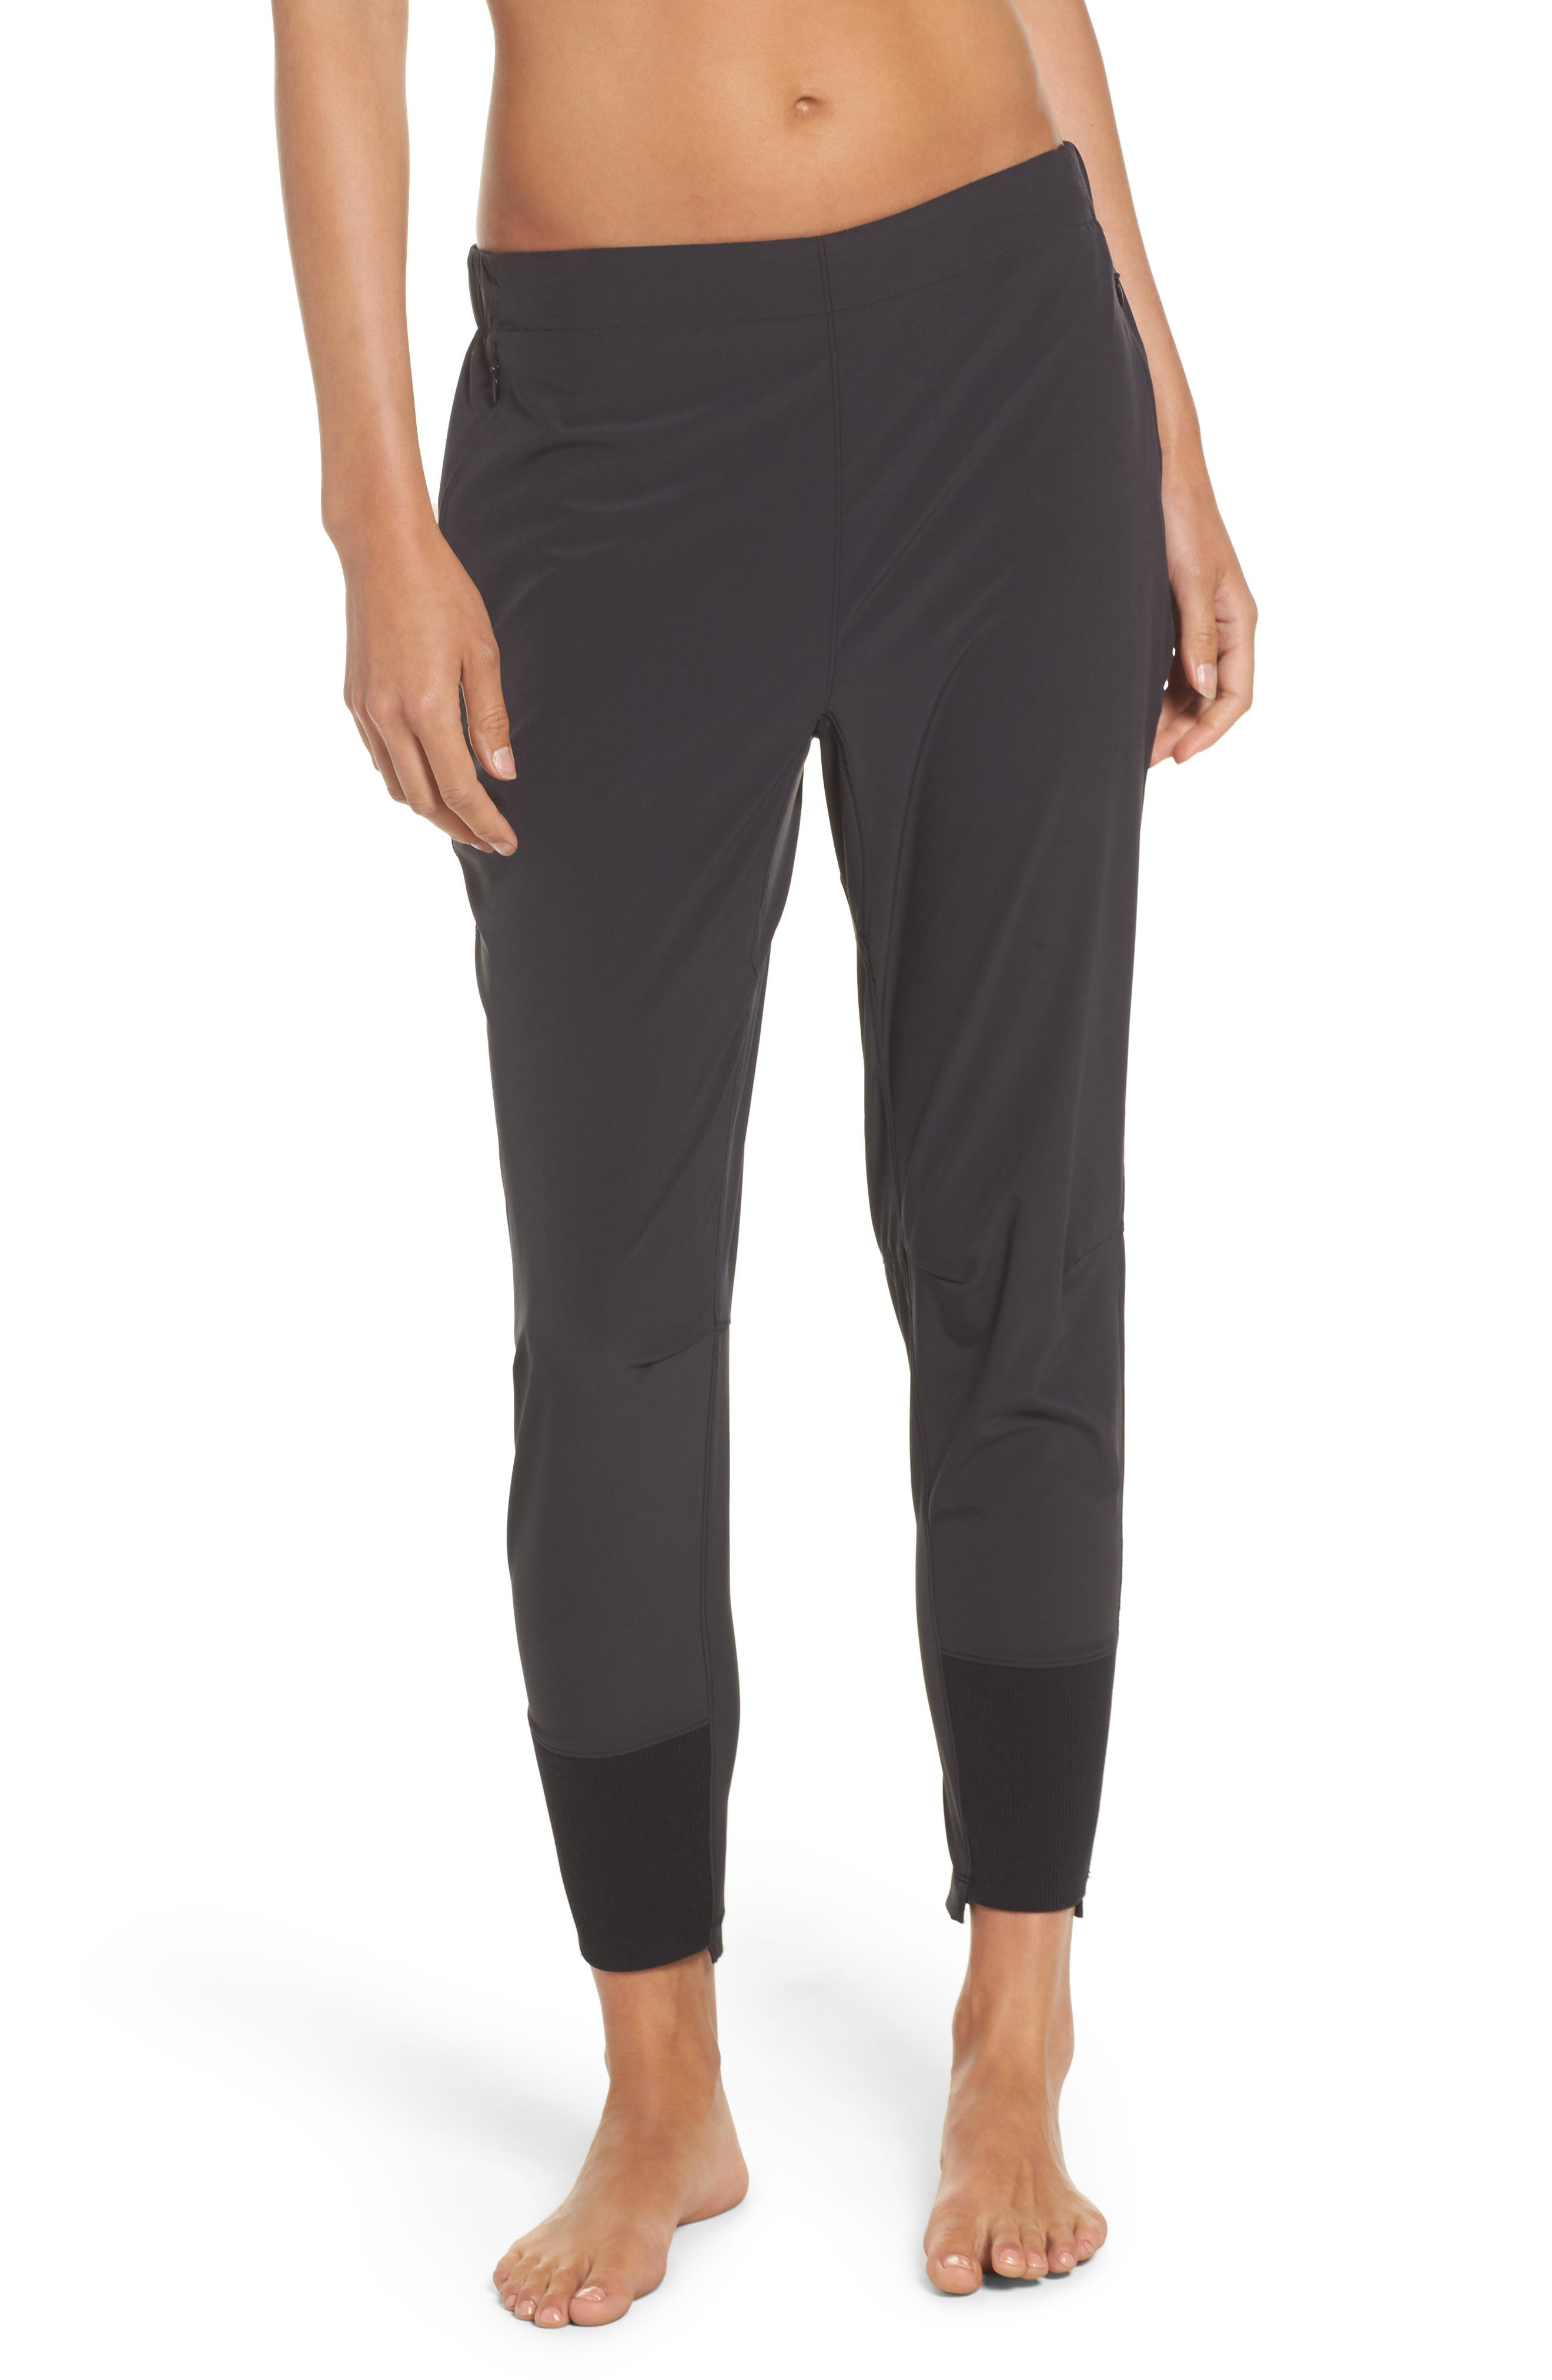 Splits59 Cooldown Sweatpants